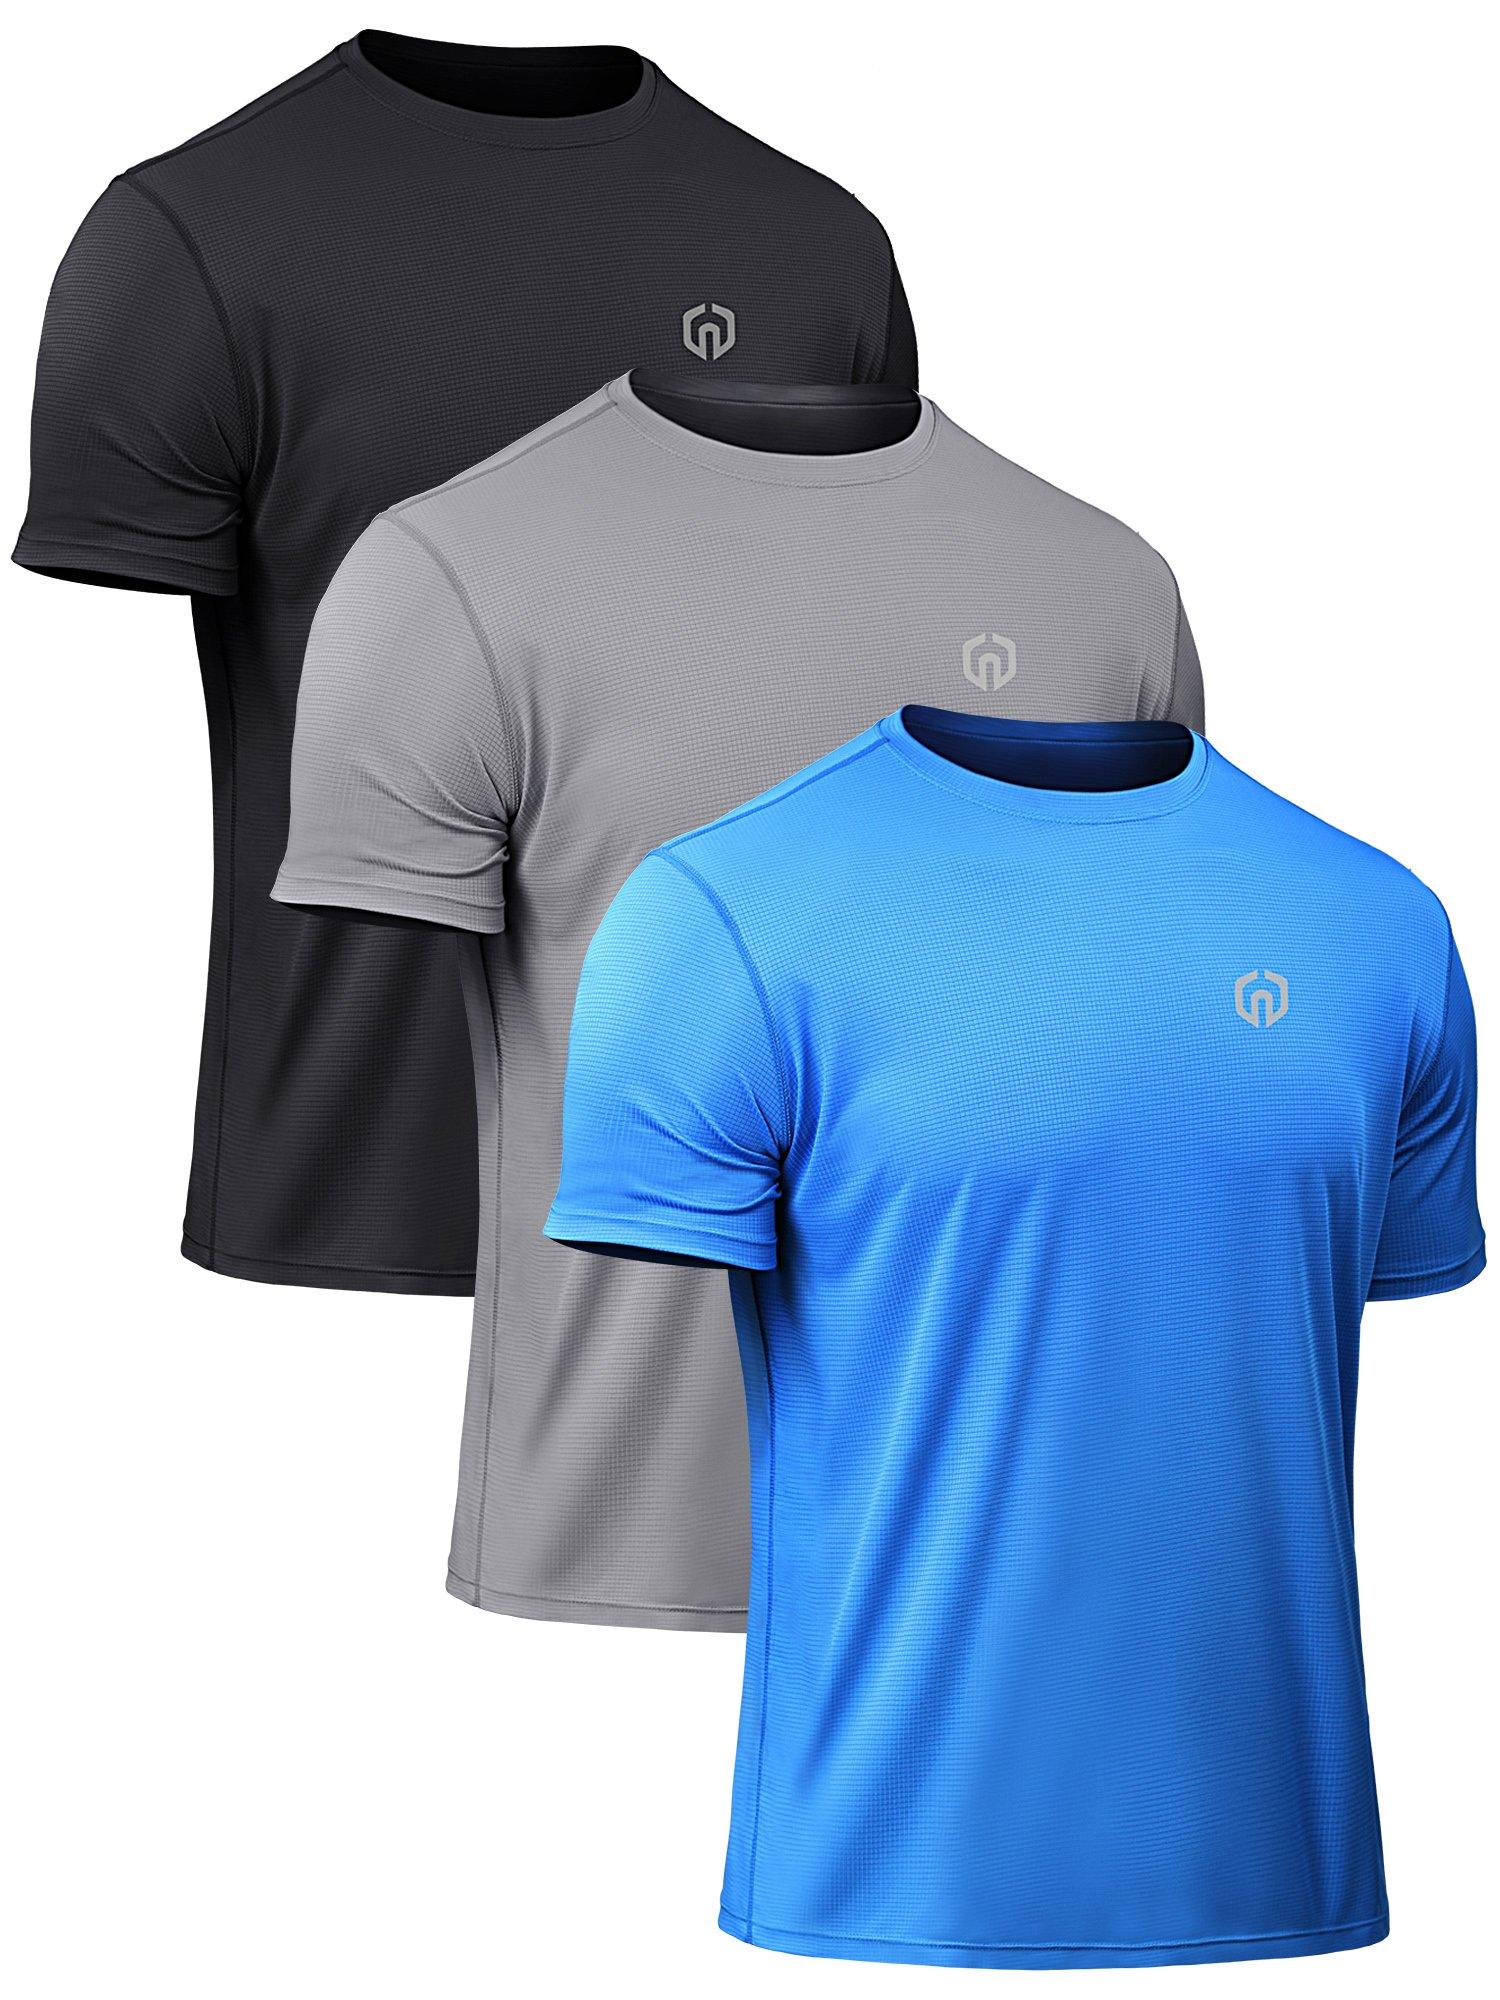 Neleus Men's Mesh Running Sports Workout Shirts,5052,3 Pack,Black,Grey,Blue,L,EU XL